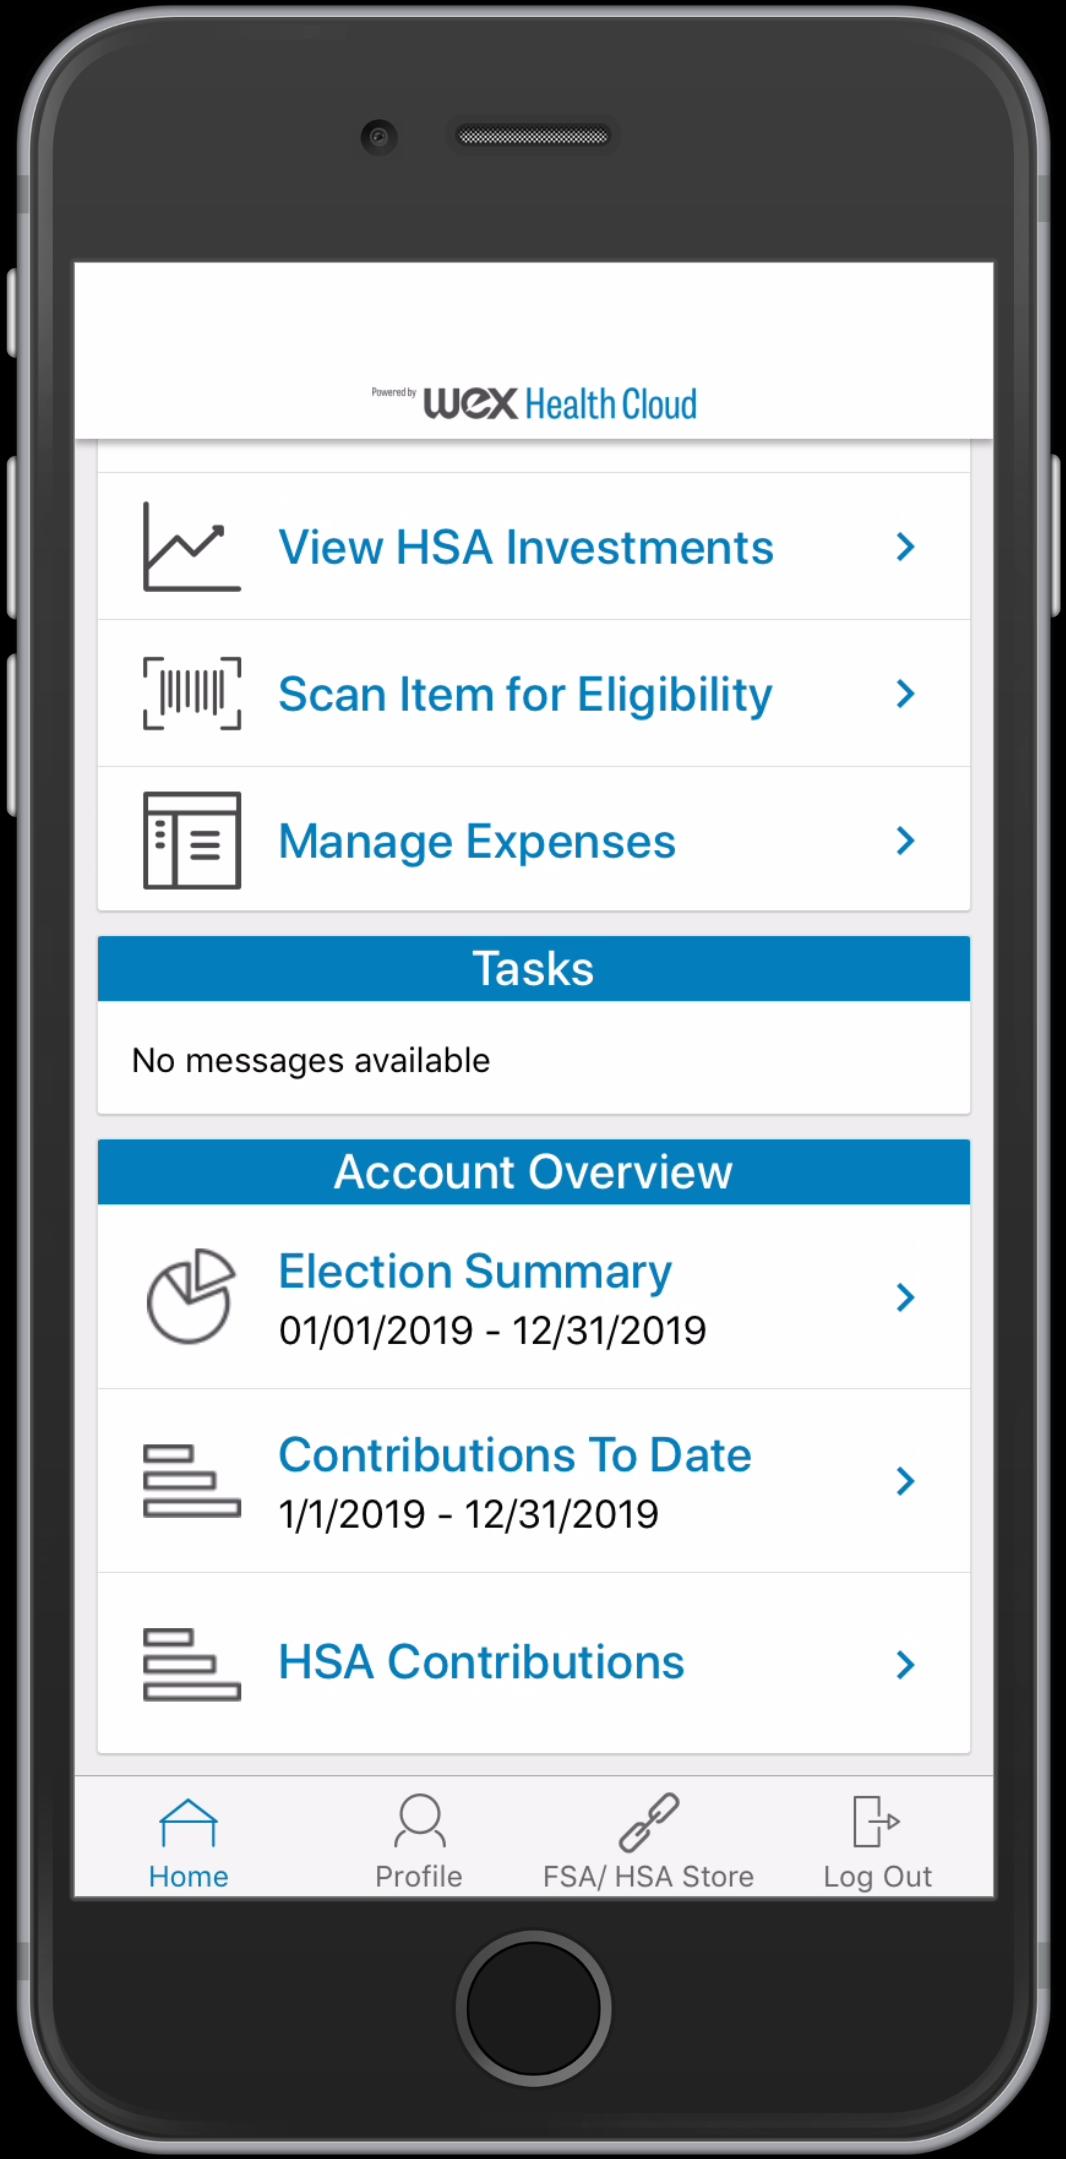 WEX Health Cloud Mobile App_HSA Home Screen